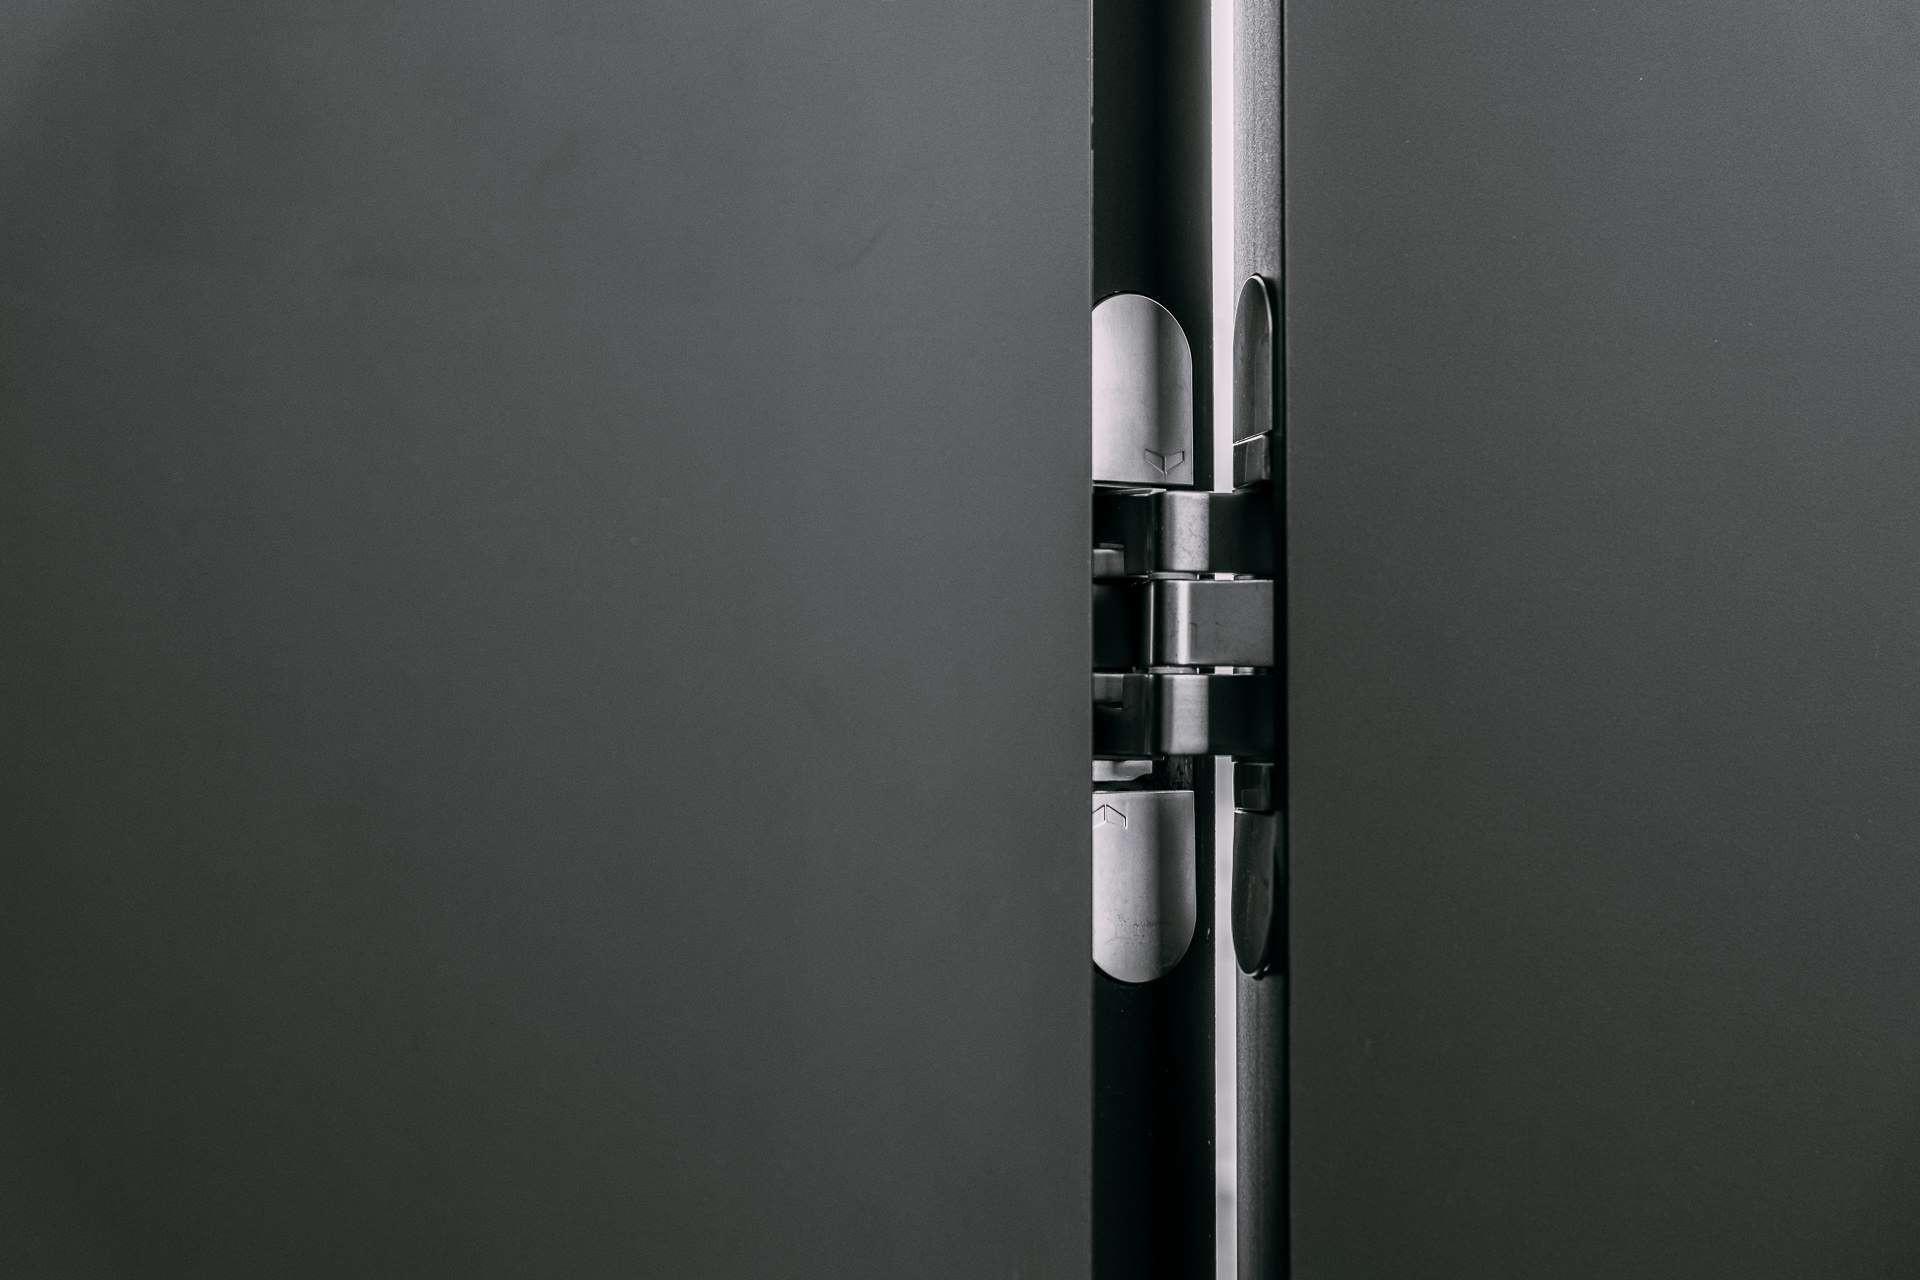 ATA Interieur - Realisatie - Onzichtbare scharnier - Argenta Neo